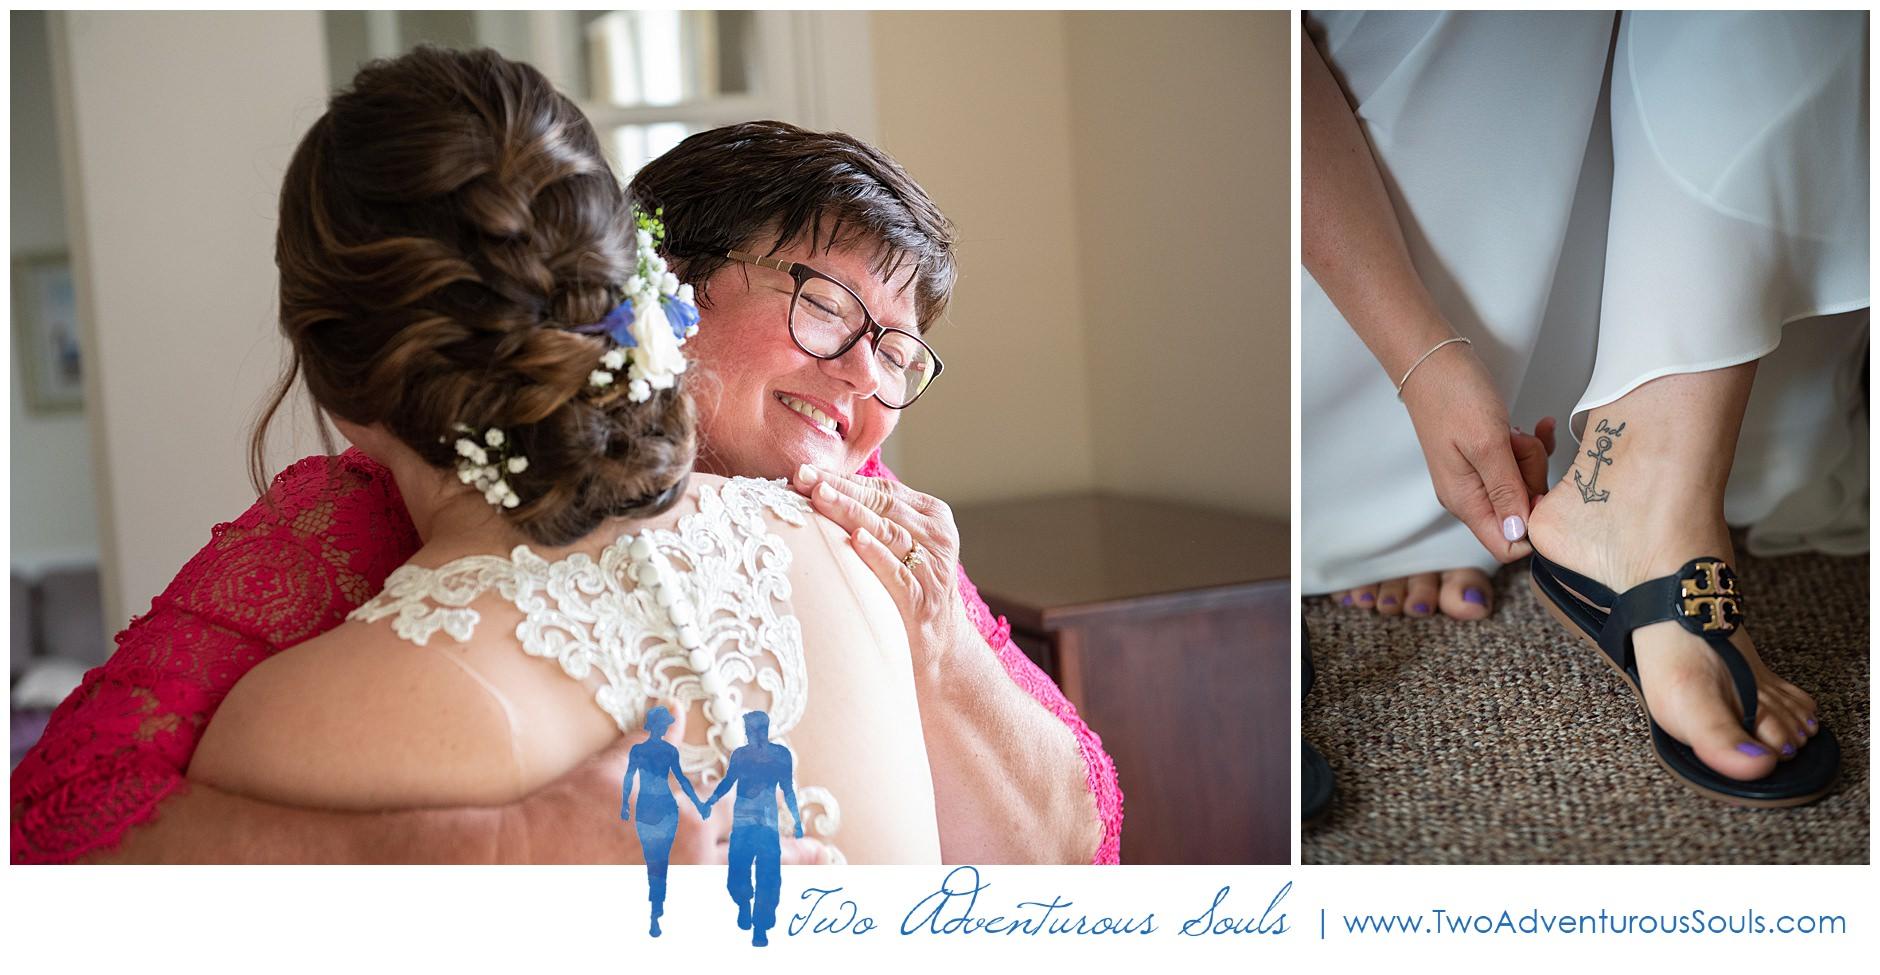 Maine Wedding Photographers, SMCC Wedding Photographers, Southern Maine Community College Wedding Photographers, Two Adventurous Souls-AshleyAaron_0011.jpg